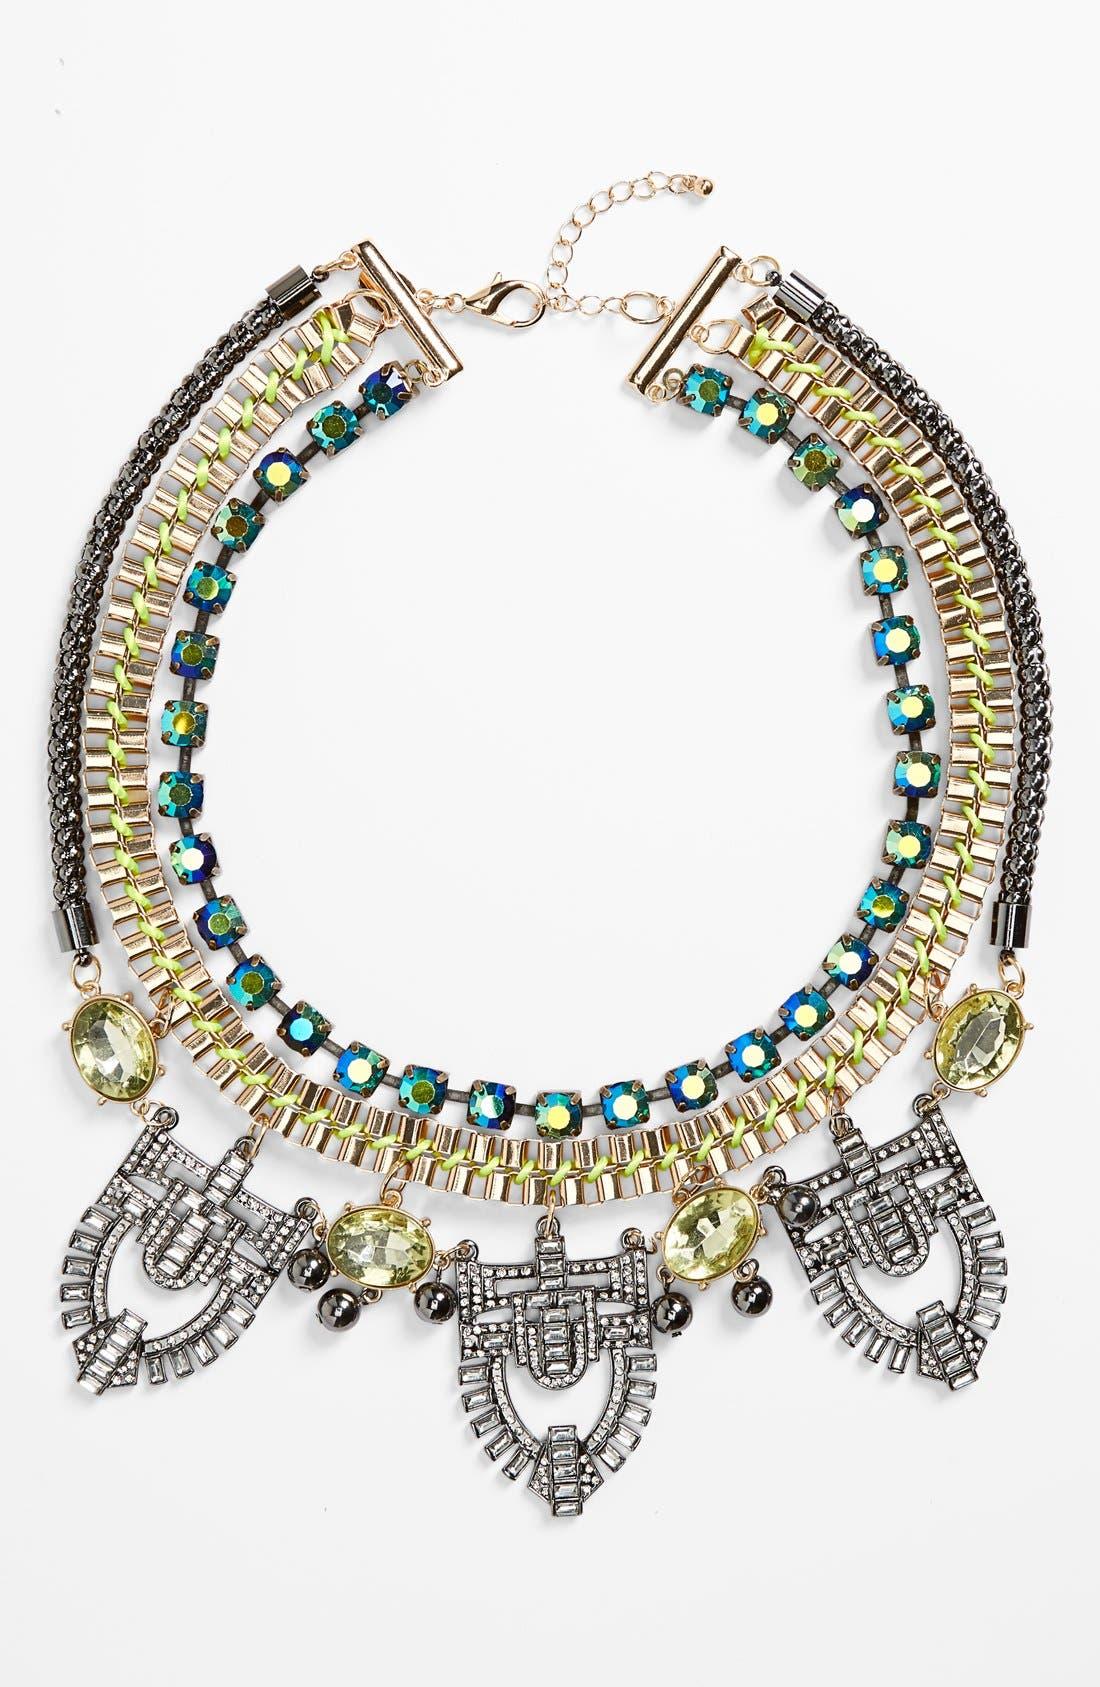 Main Image - Berry Art Deco Layered Bib Necklace